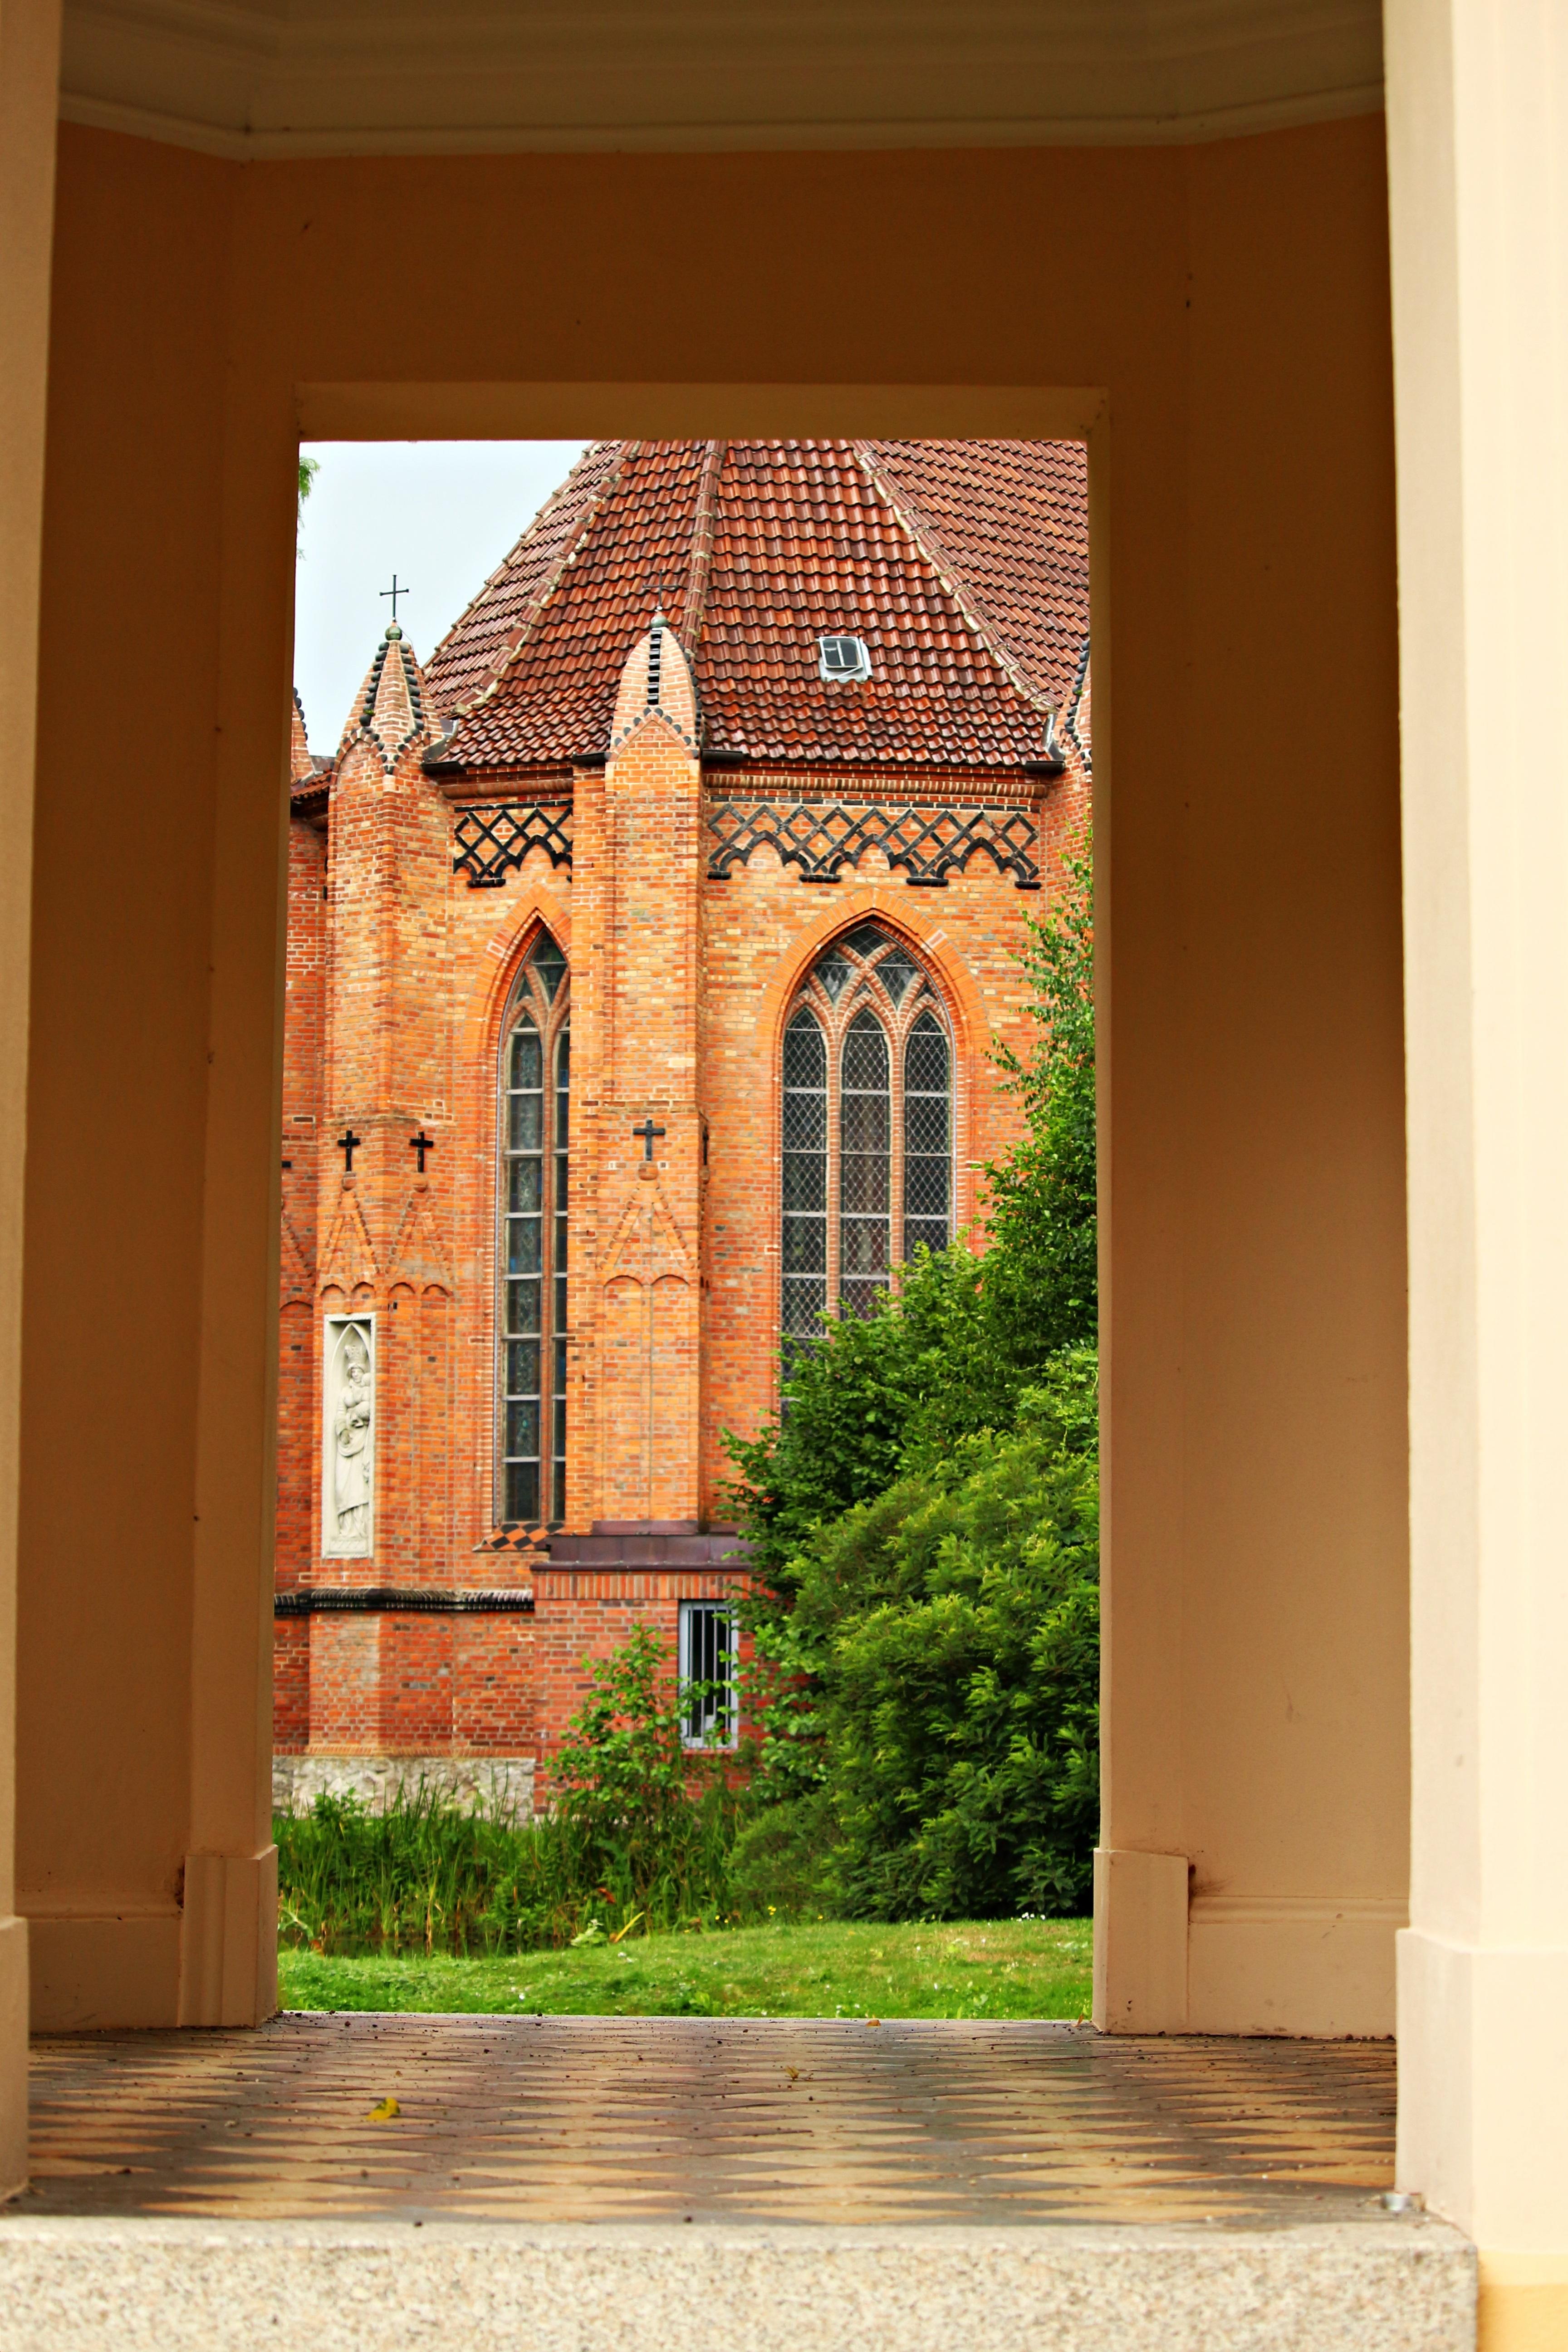 arch facade chapel old building brick door goal place of worship bell tower interior design steeple estate castle park ludwigslust parchim